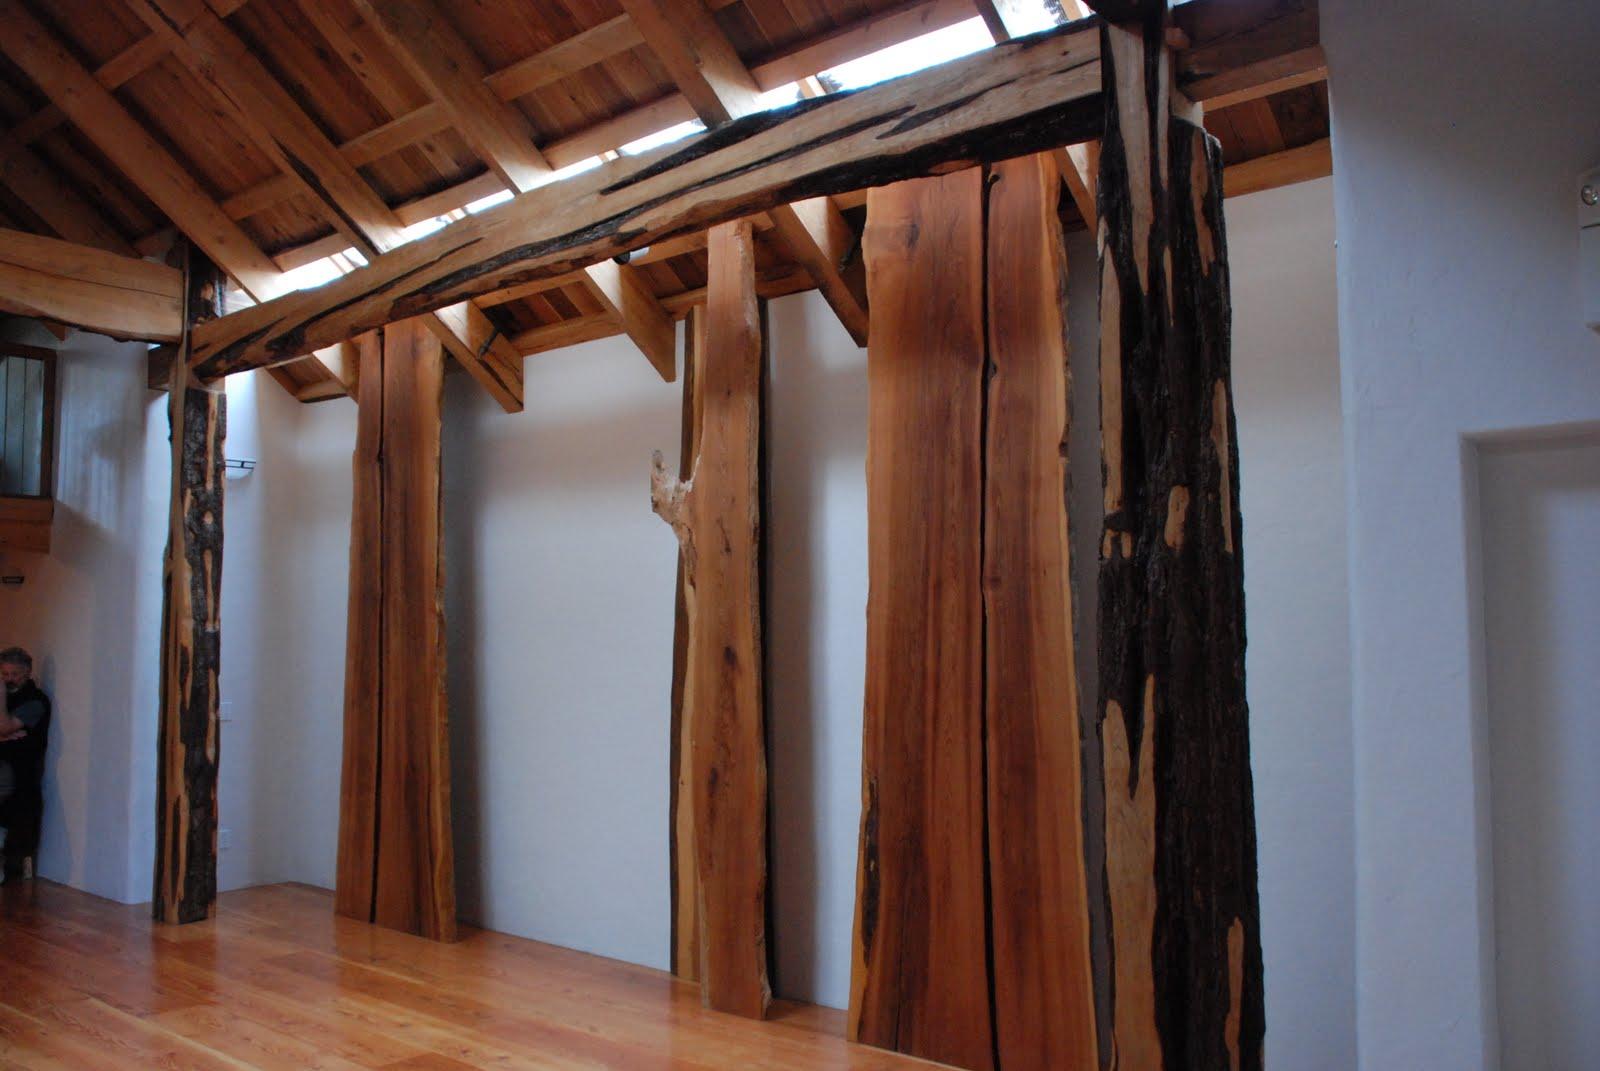 Issaquah Cedar & Lumber: Live Edge